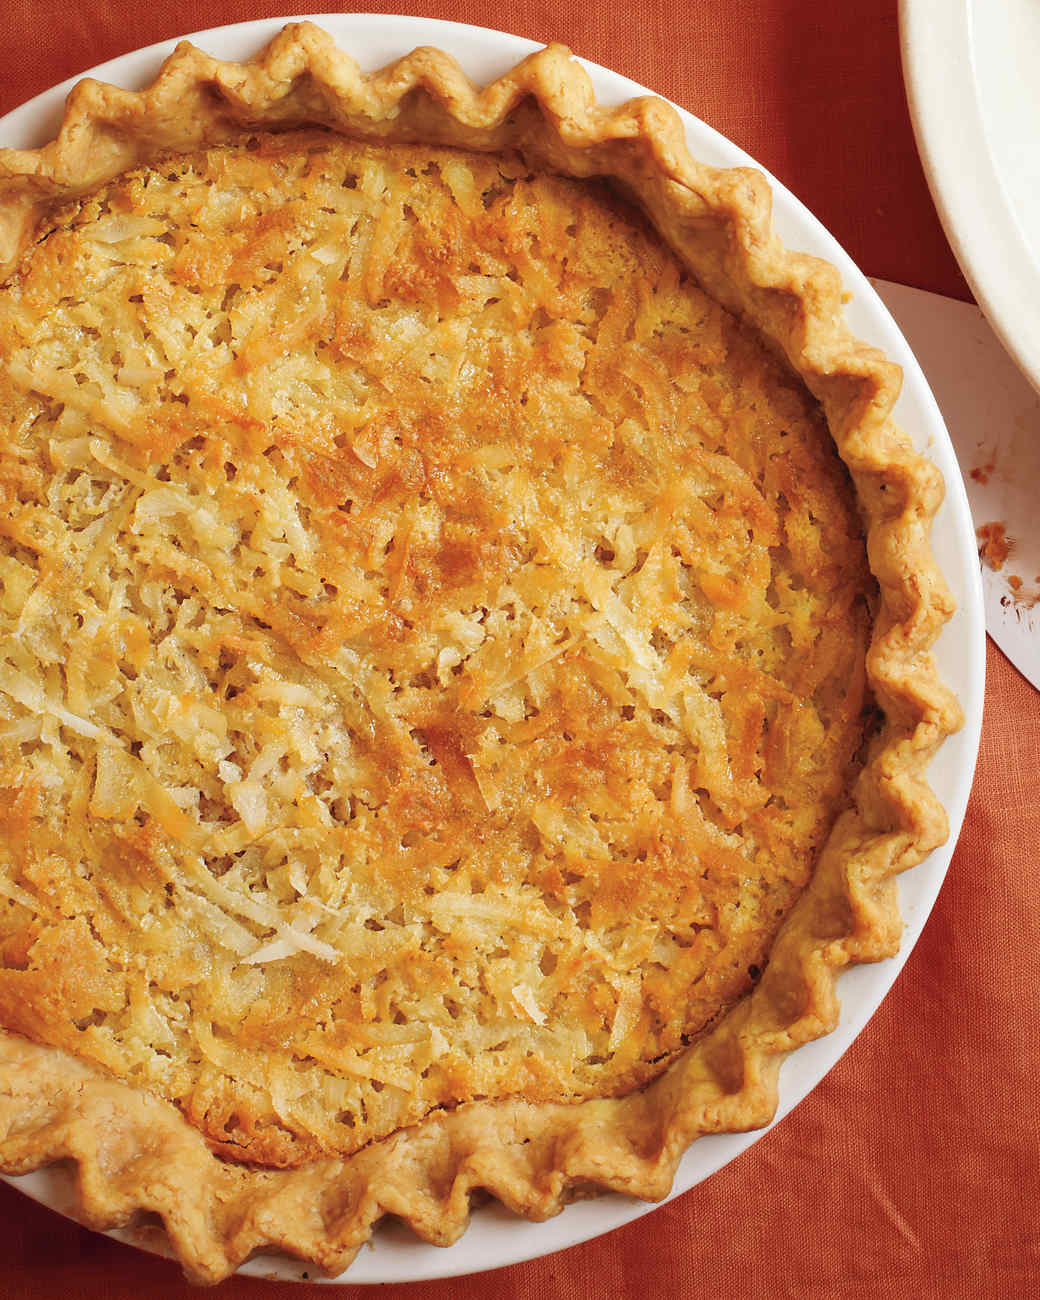 president-tylers-pudding-pie-m109160.jpg